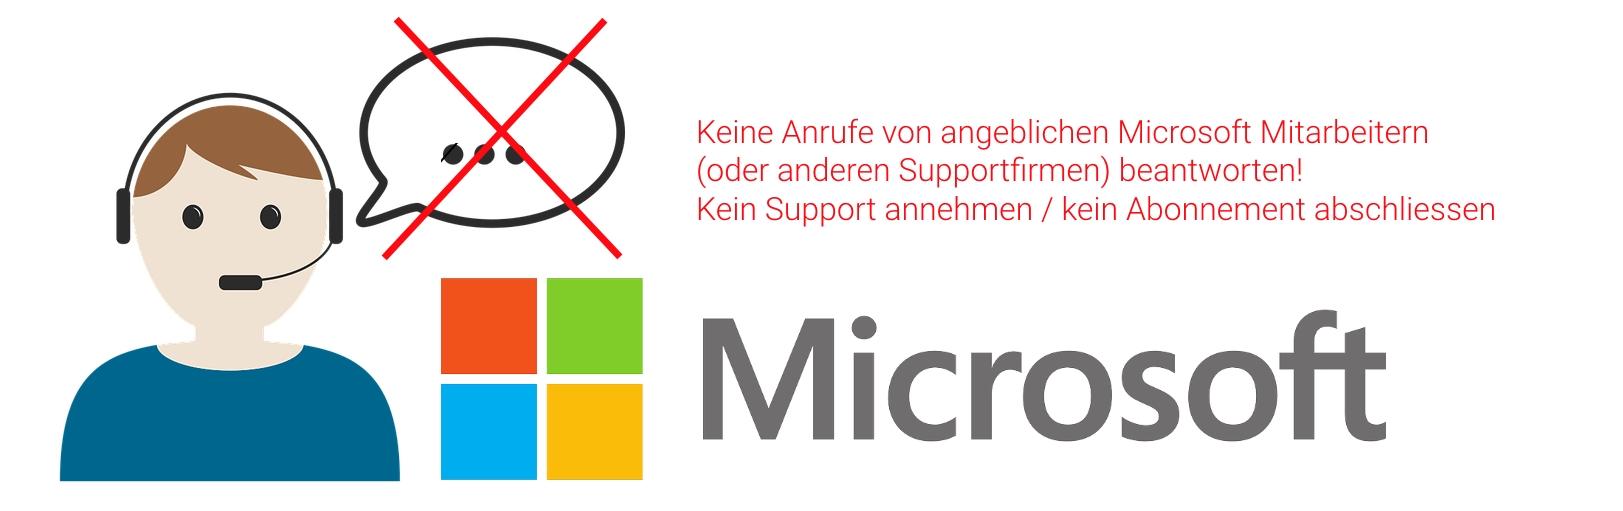 Microsoft Anrufe